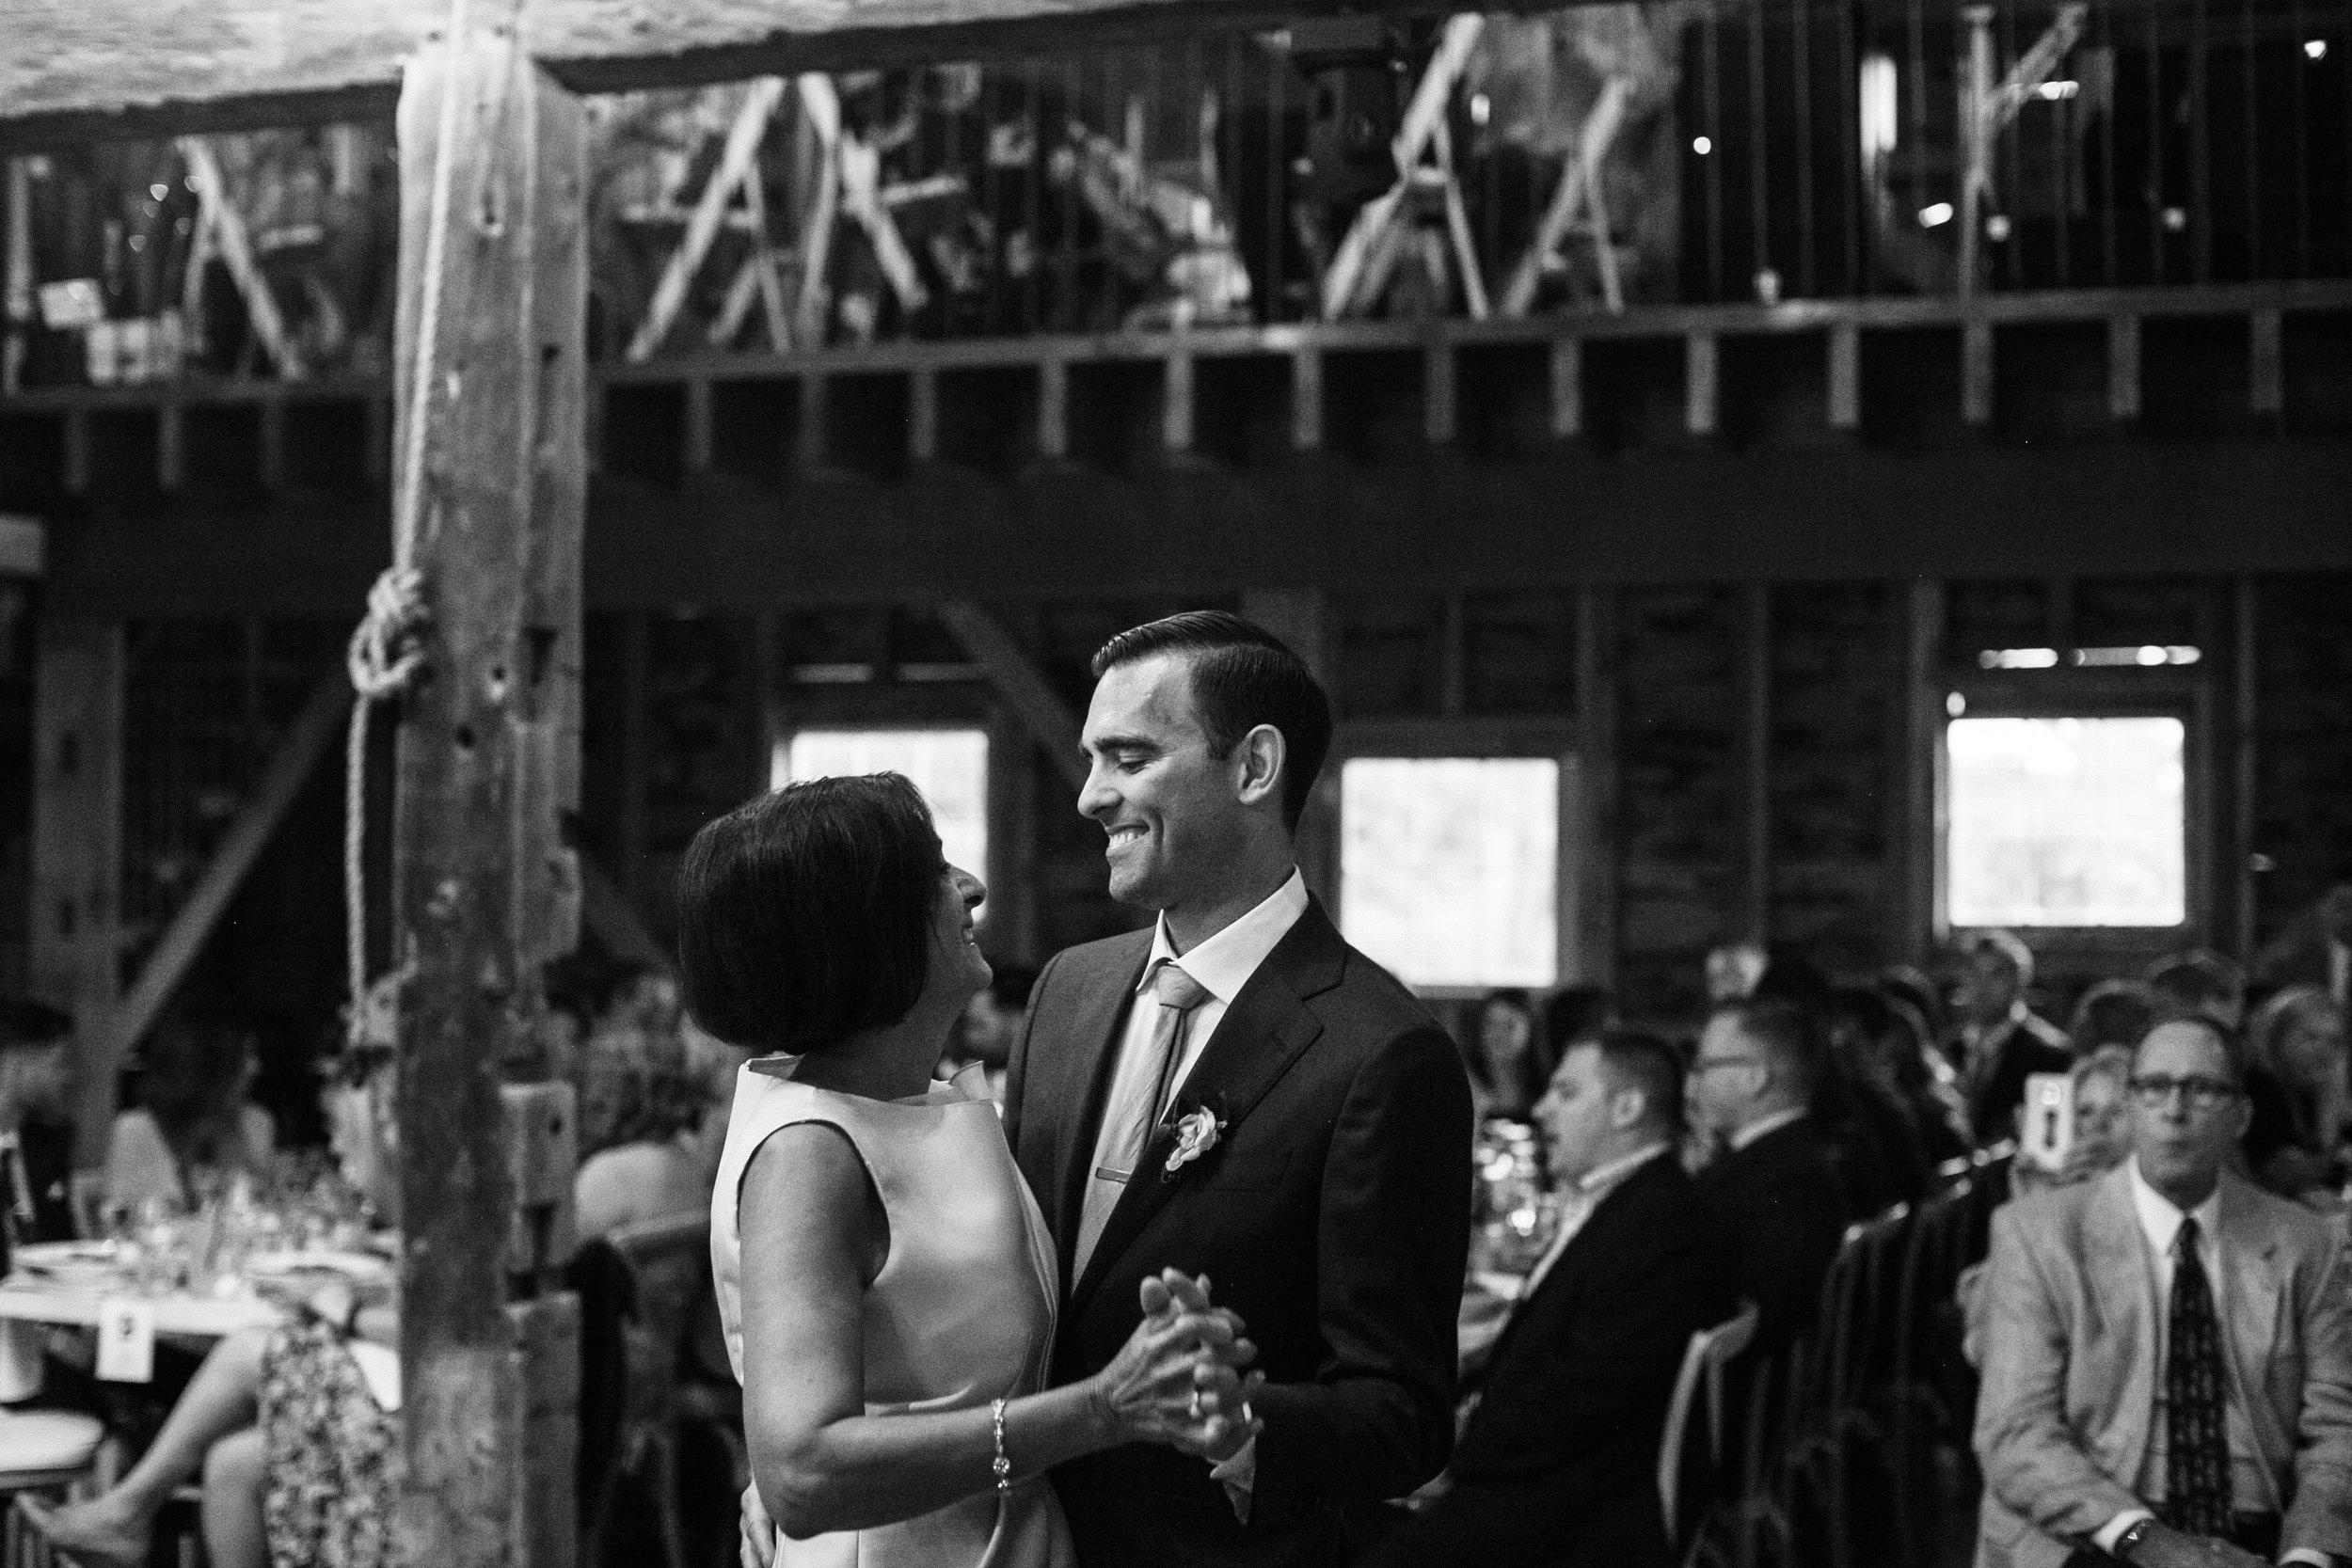 Courtney + Matt Blenheim Hill Farm Catskills NY Wedding Veronica Lola Photography 2017-575.jpg